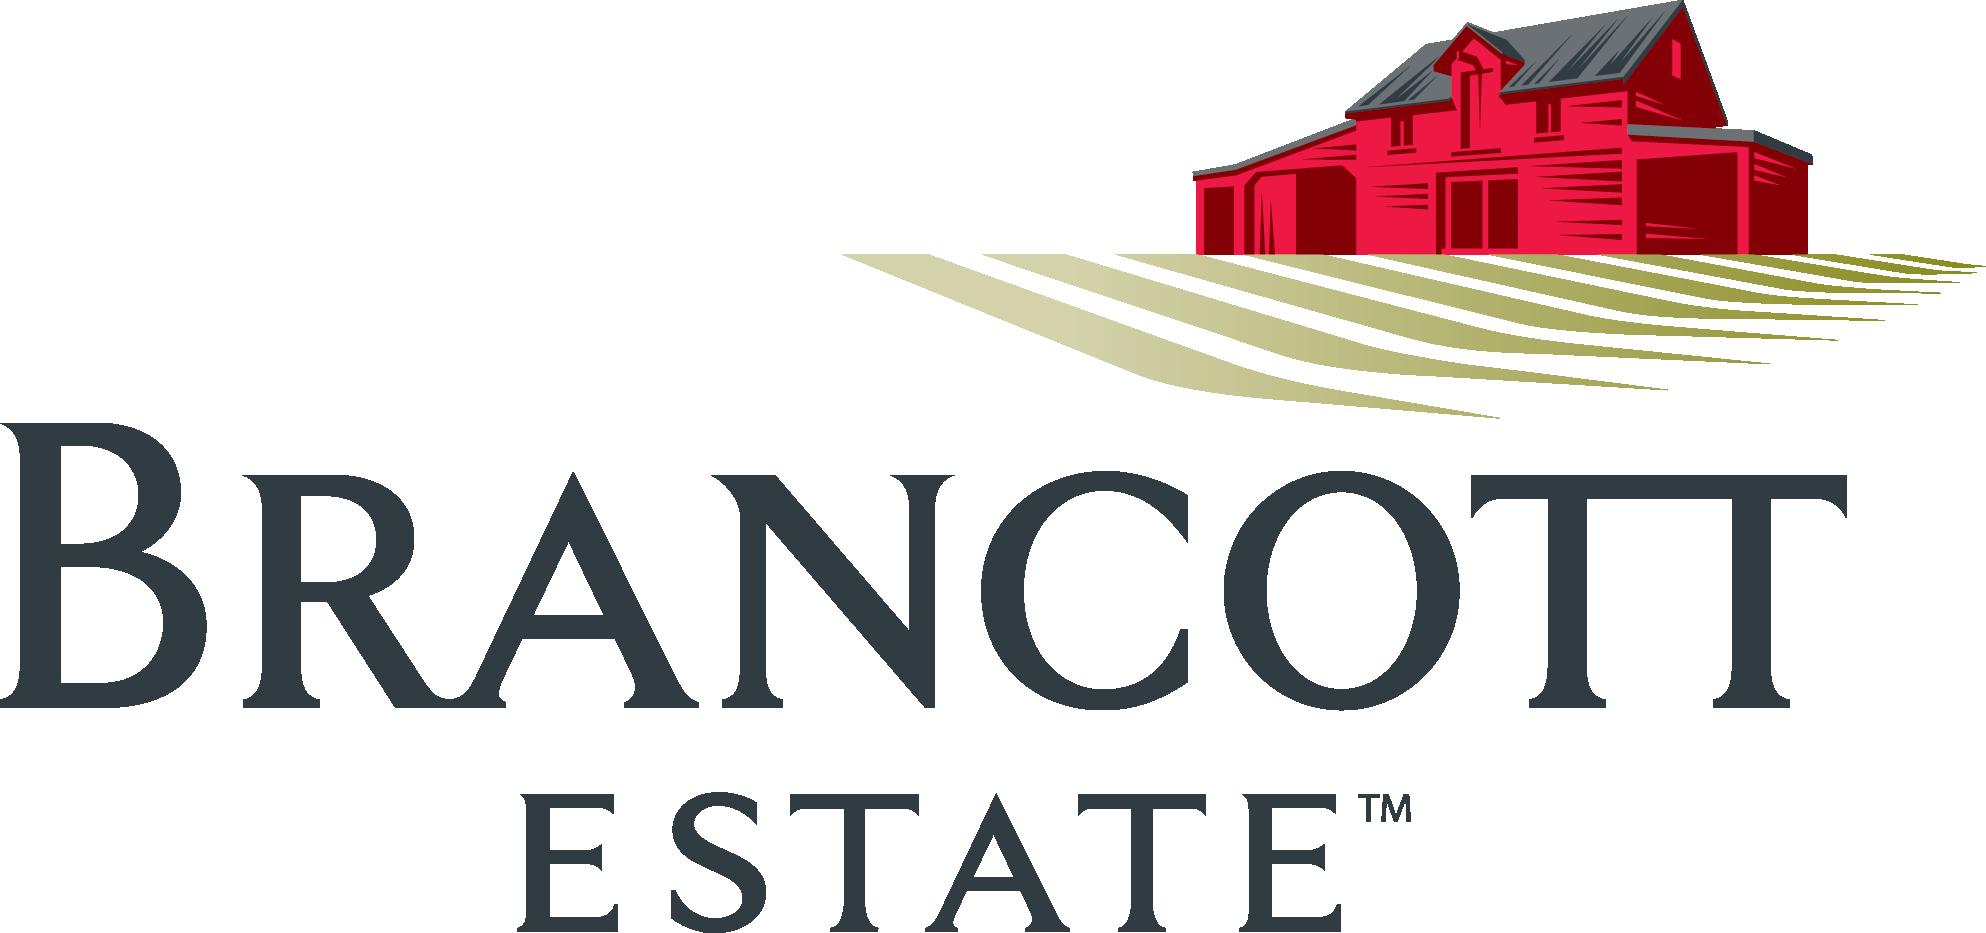 Brancott Estate - Brand Logo_1 (2).png